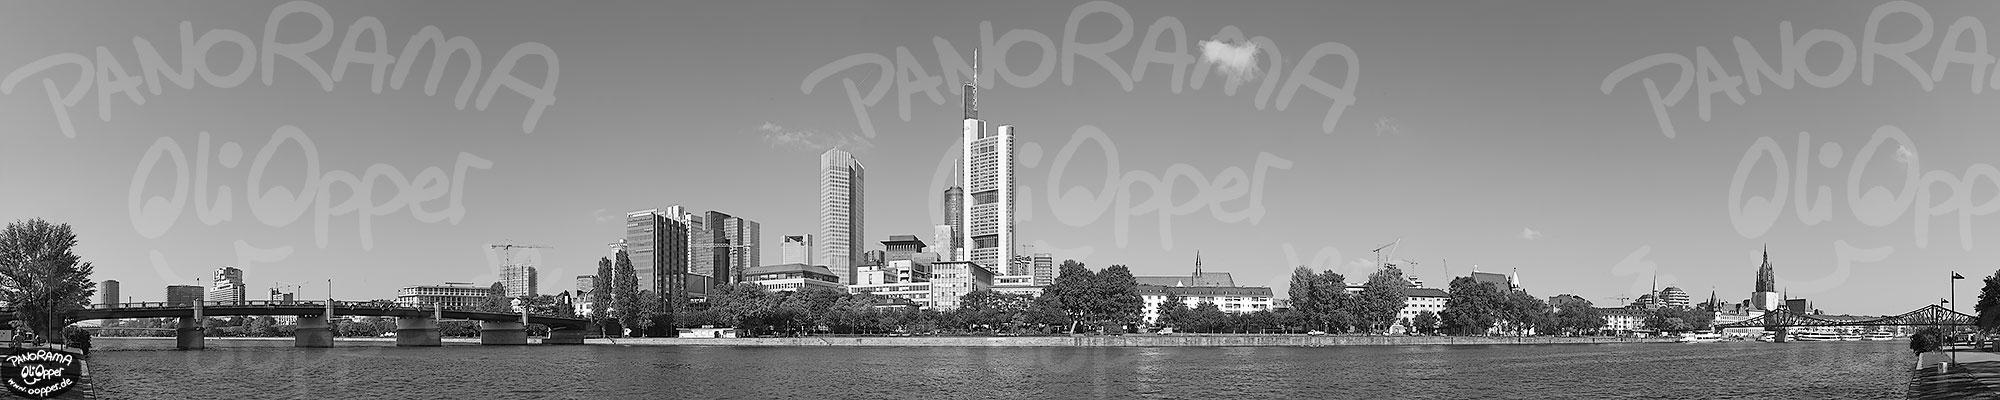 Frankfurt  schwarzweiß  Tag  p8310  (c) by Oliver Opper